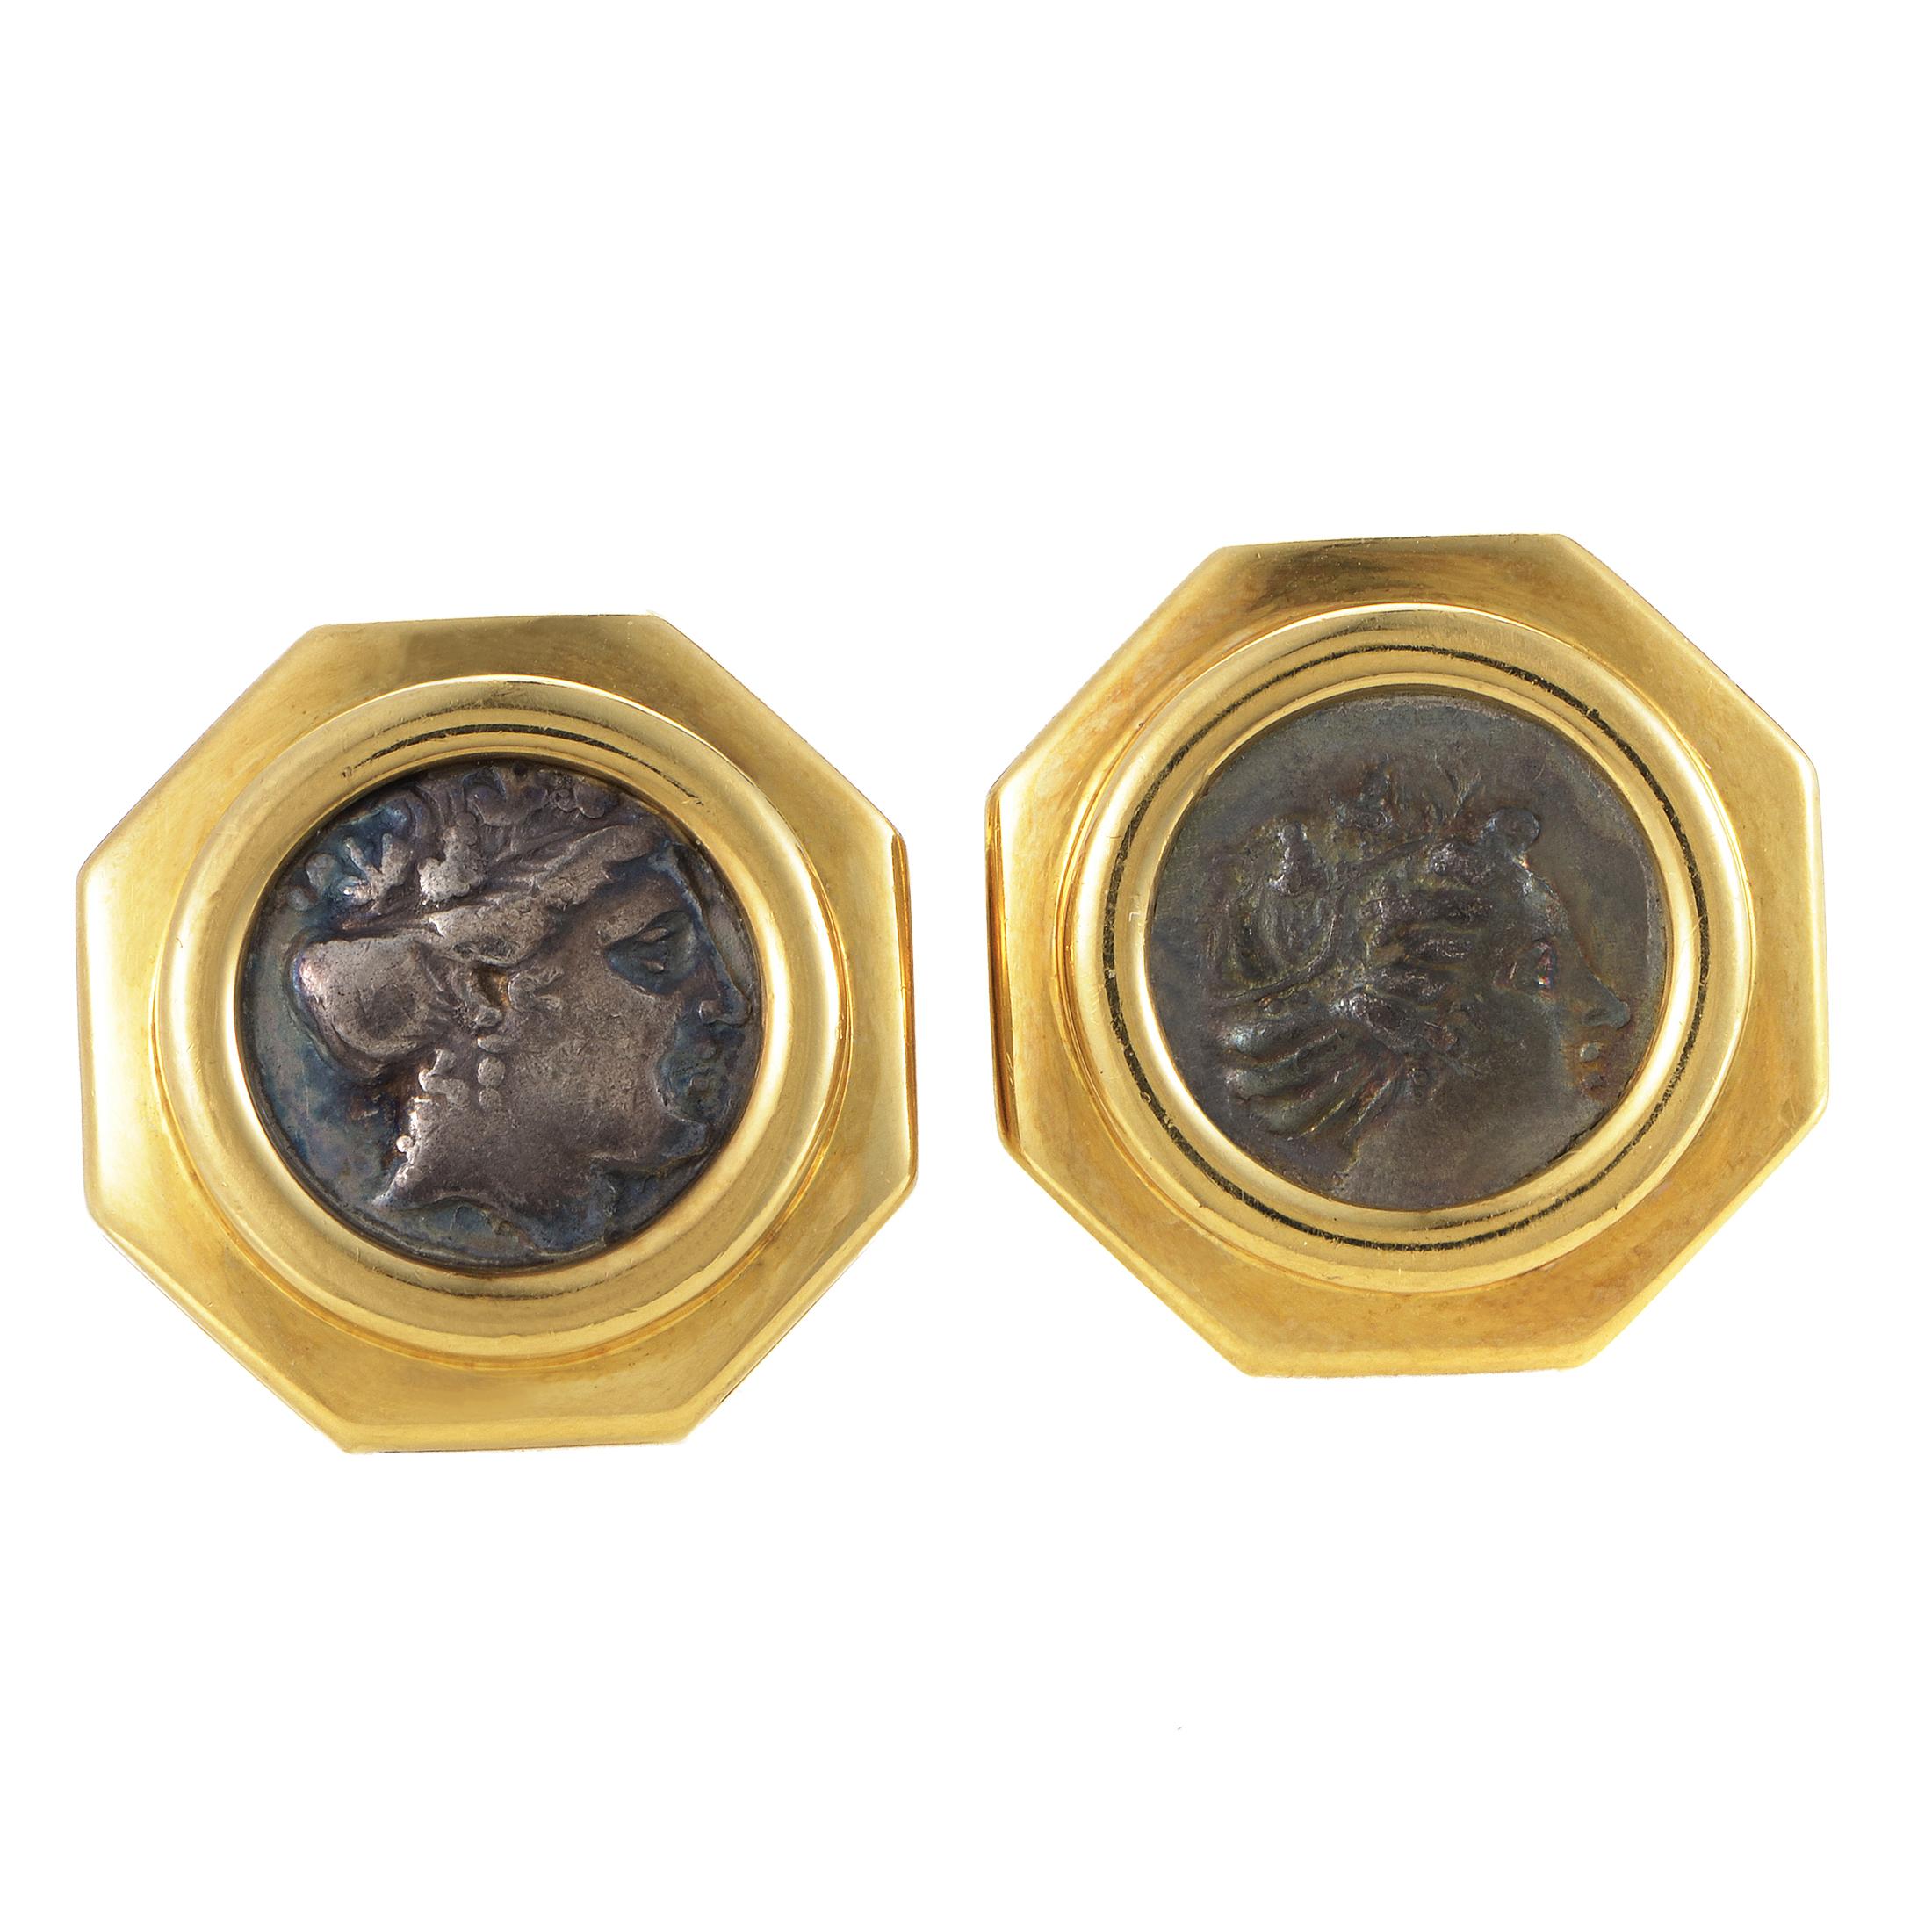 Bvlgari Monete Men's 18K Yellow Gold Ancient Coin Cufflinks